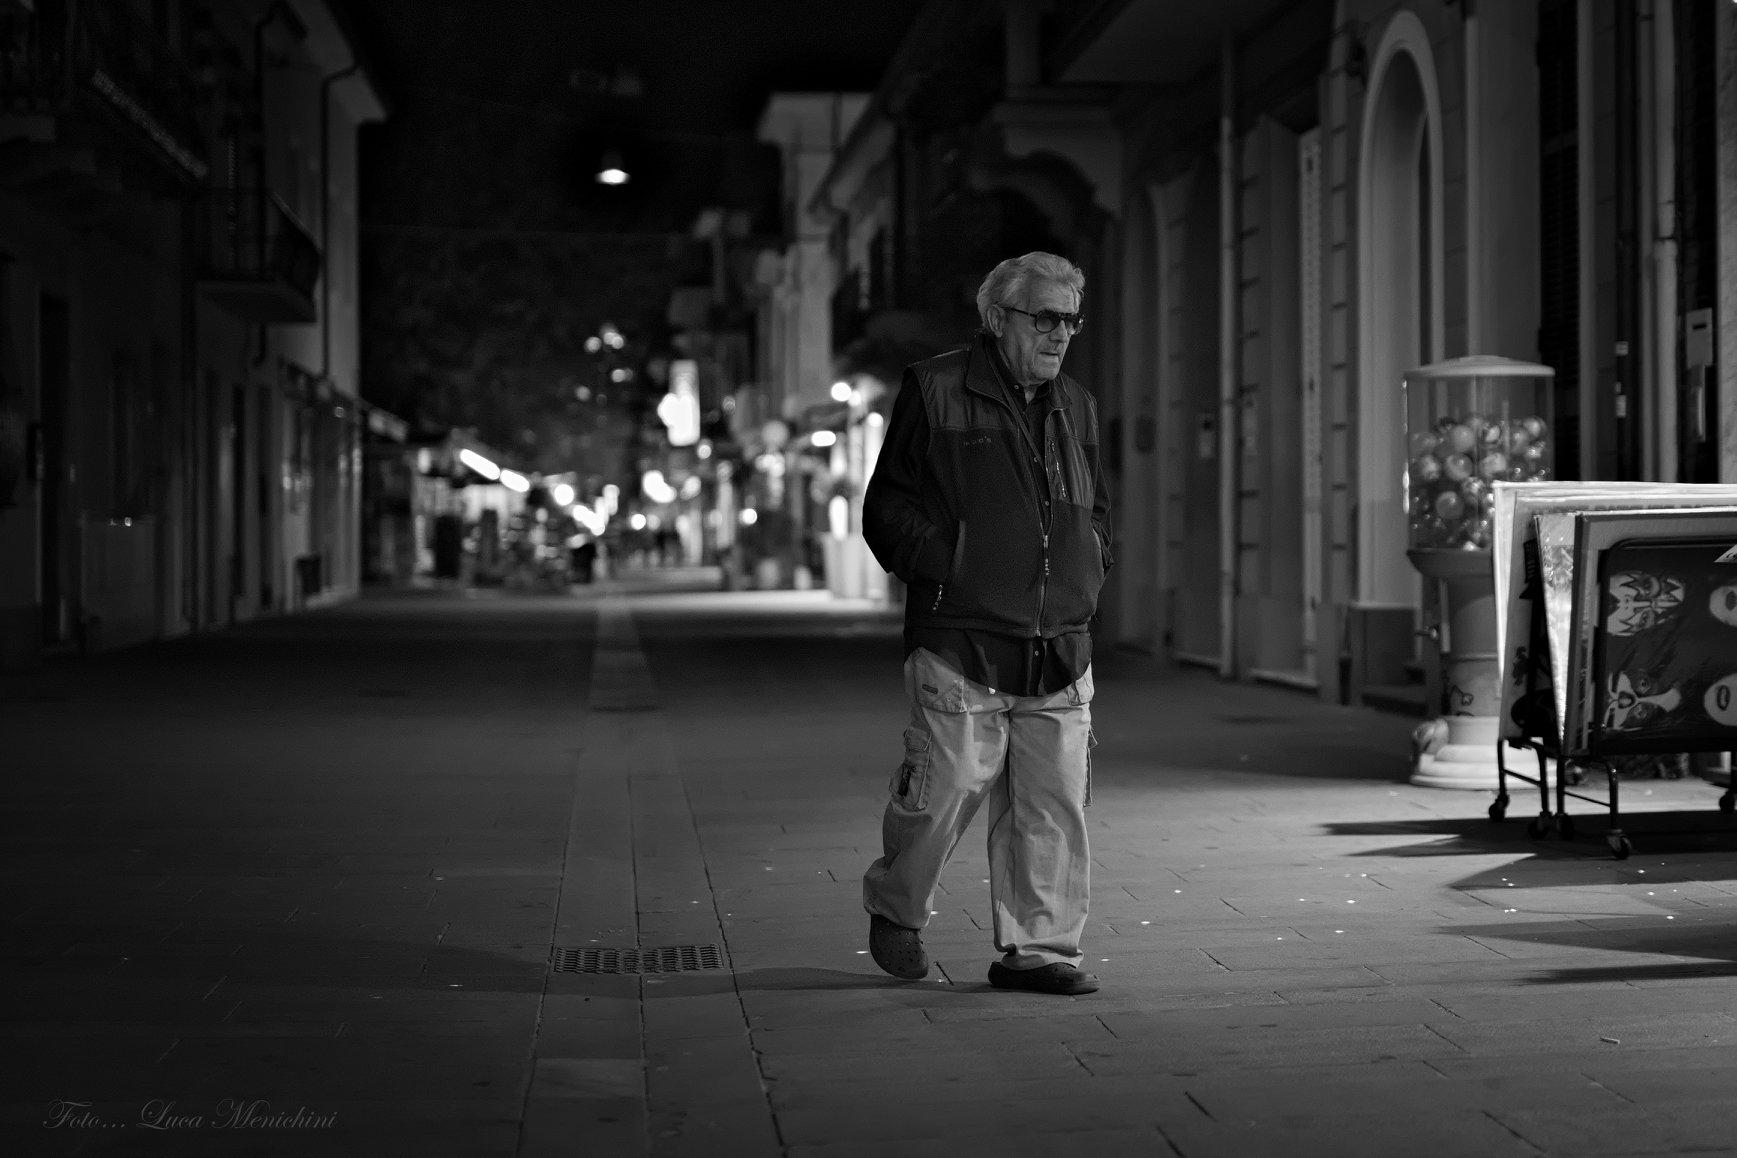 Viareggio piange la morte del fotografo Enrico Corfini